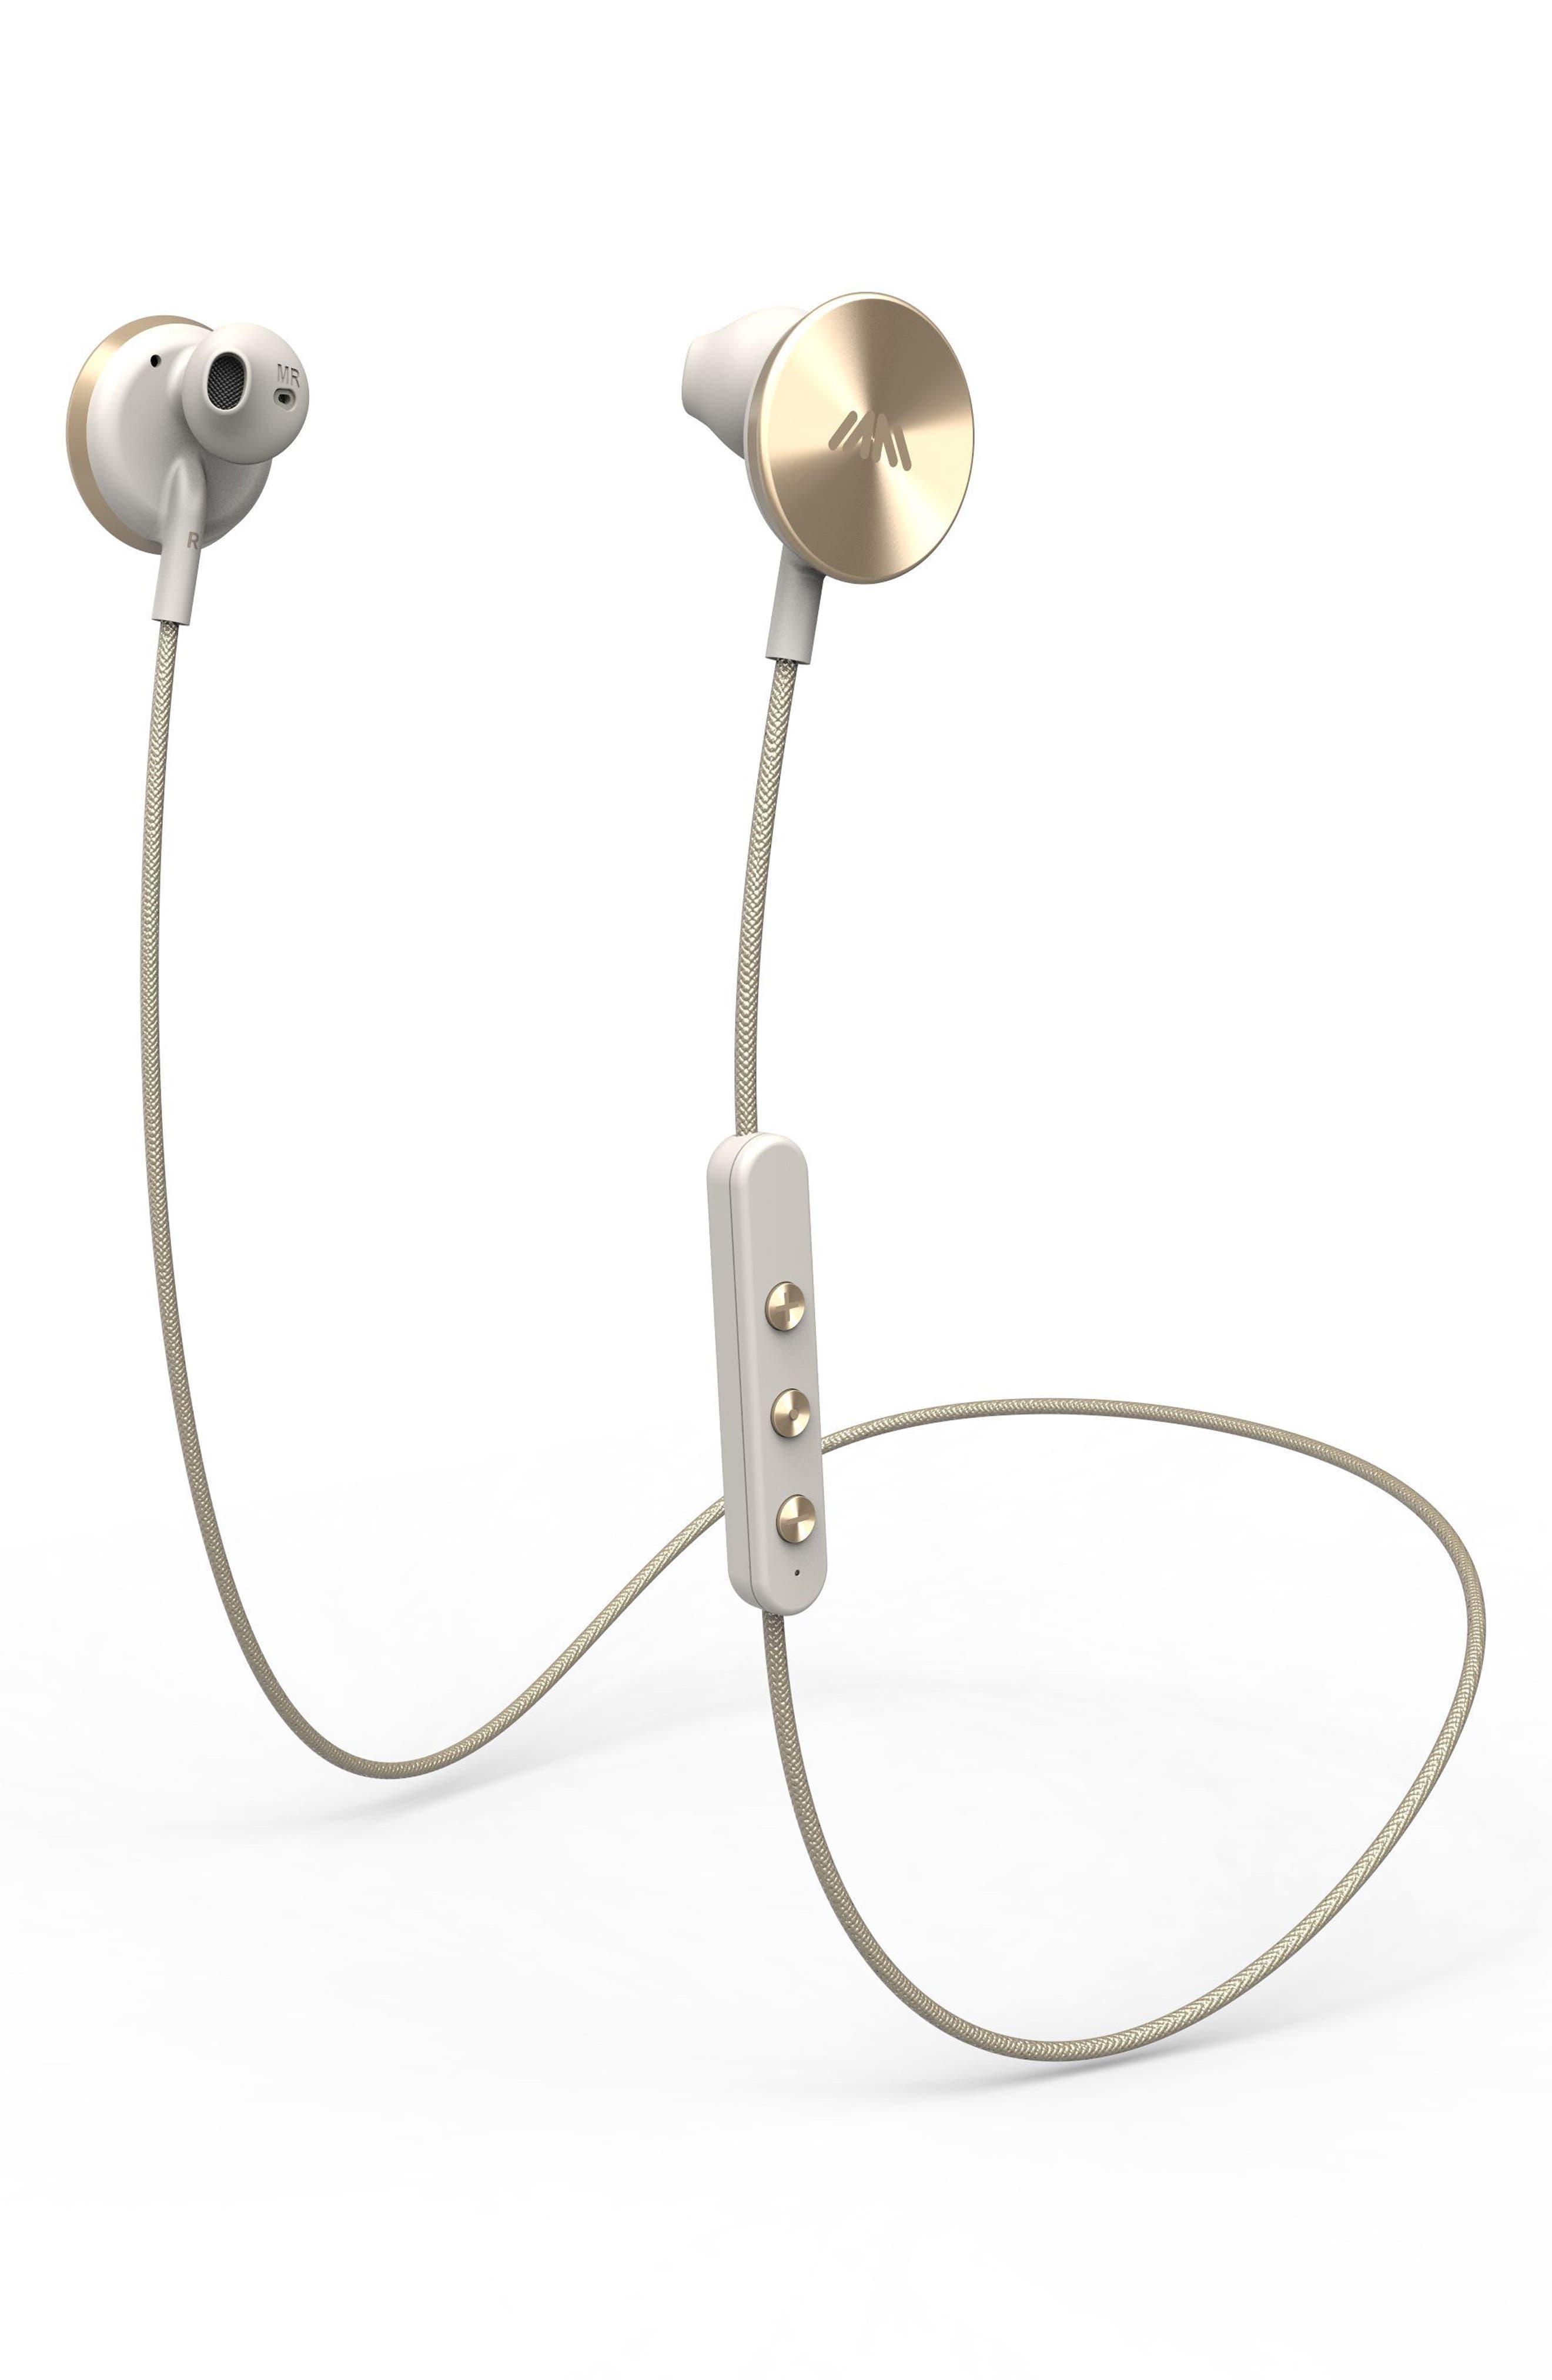 Main Image - i.am+ Buttons Bluetooth Headphones